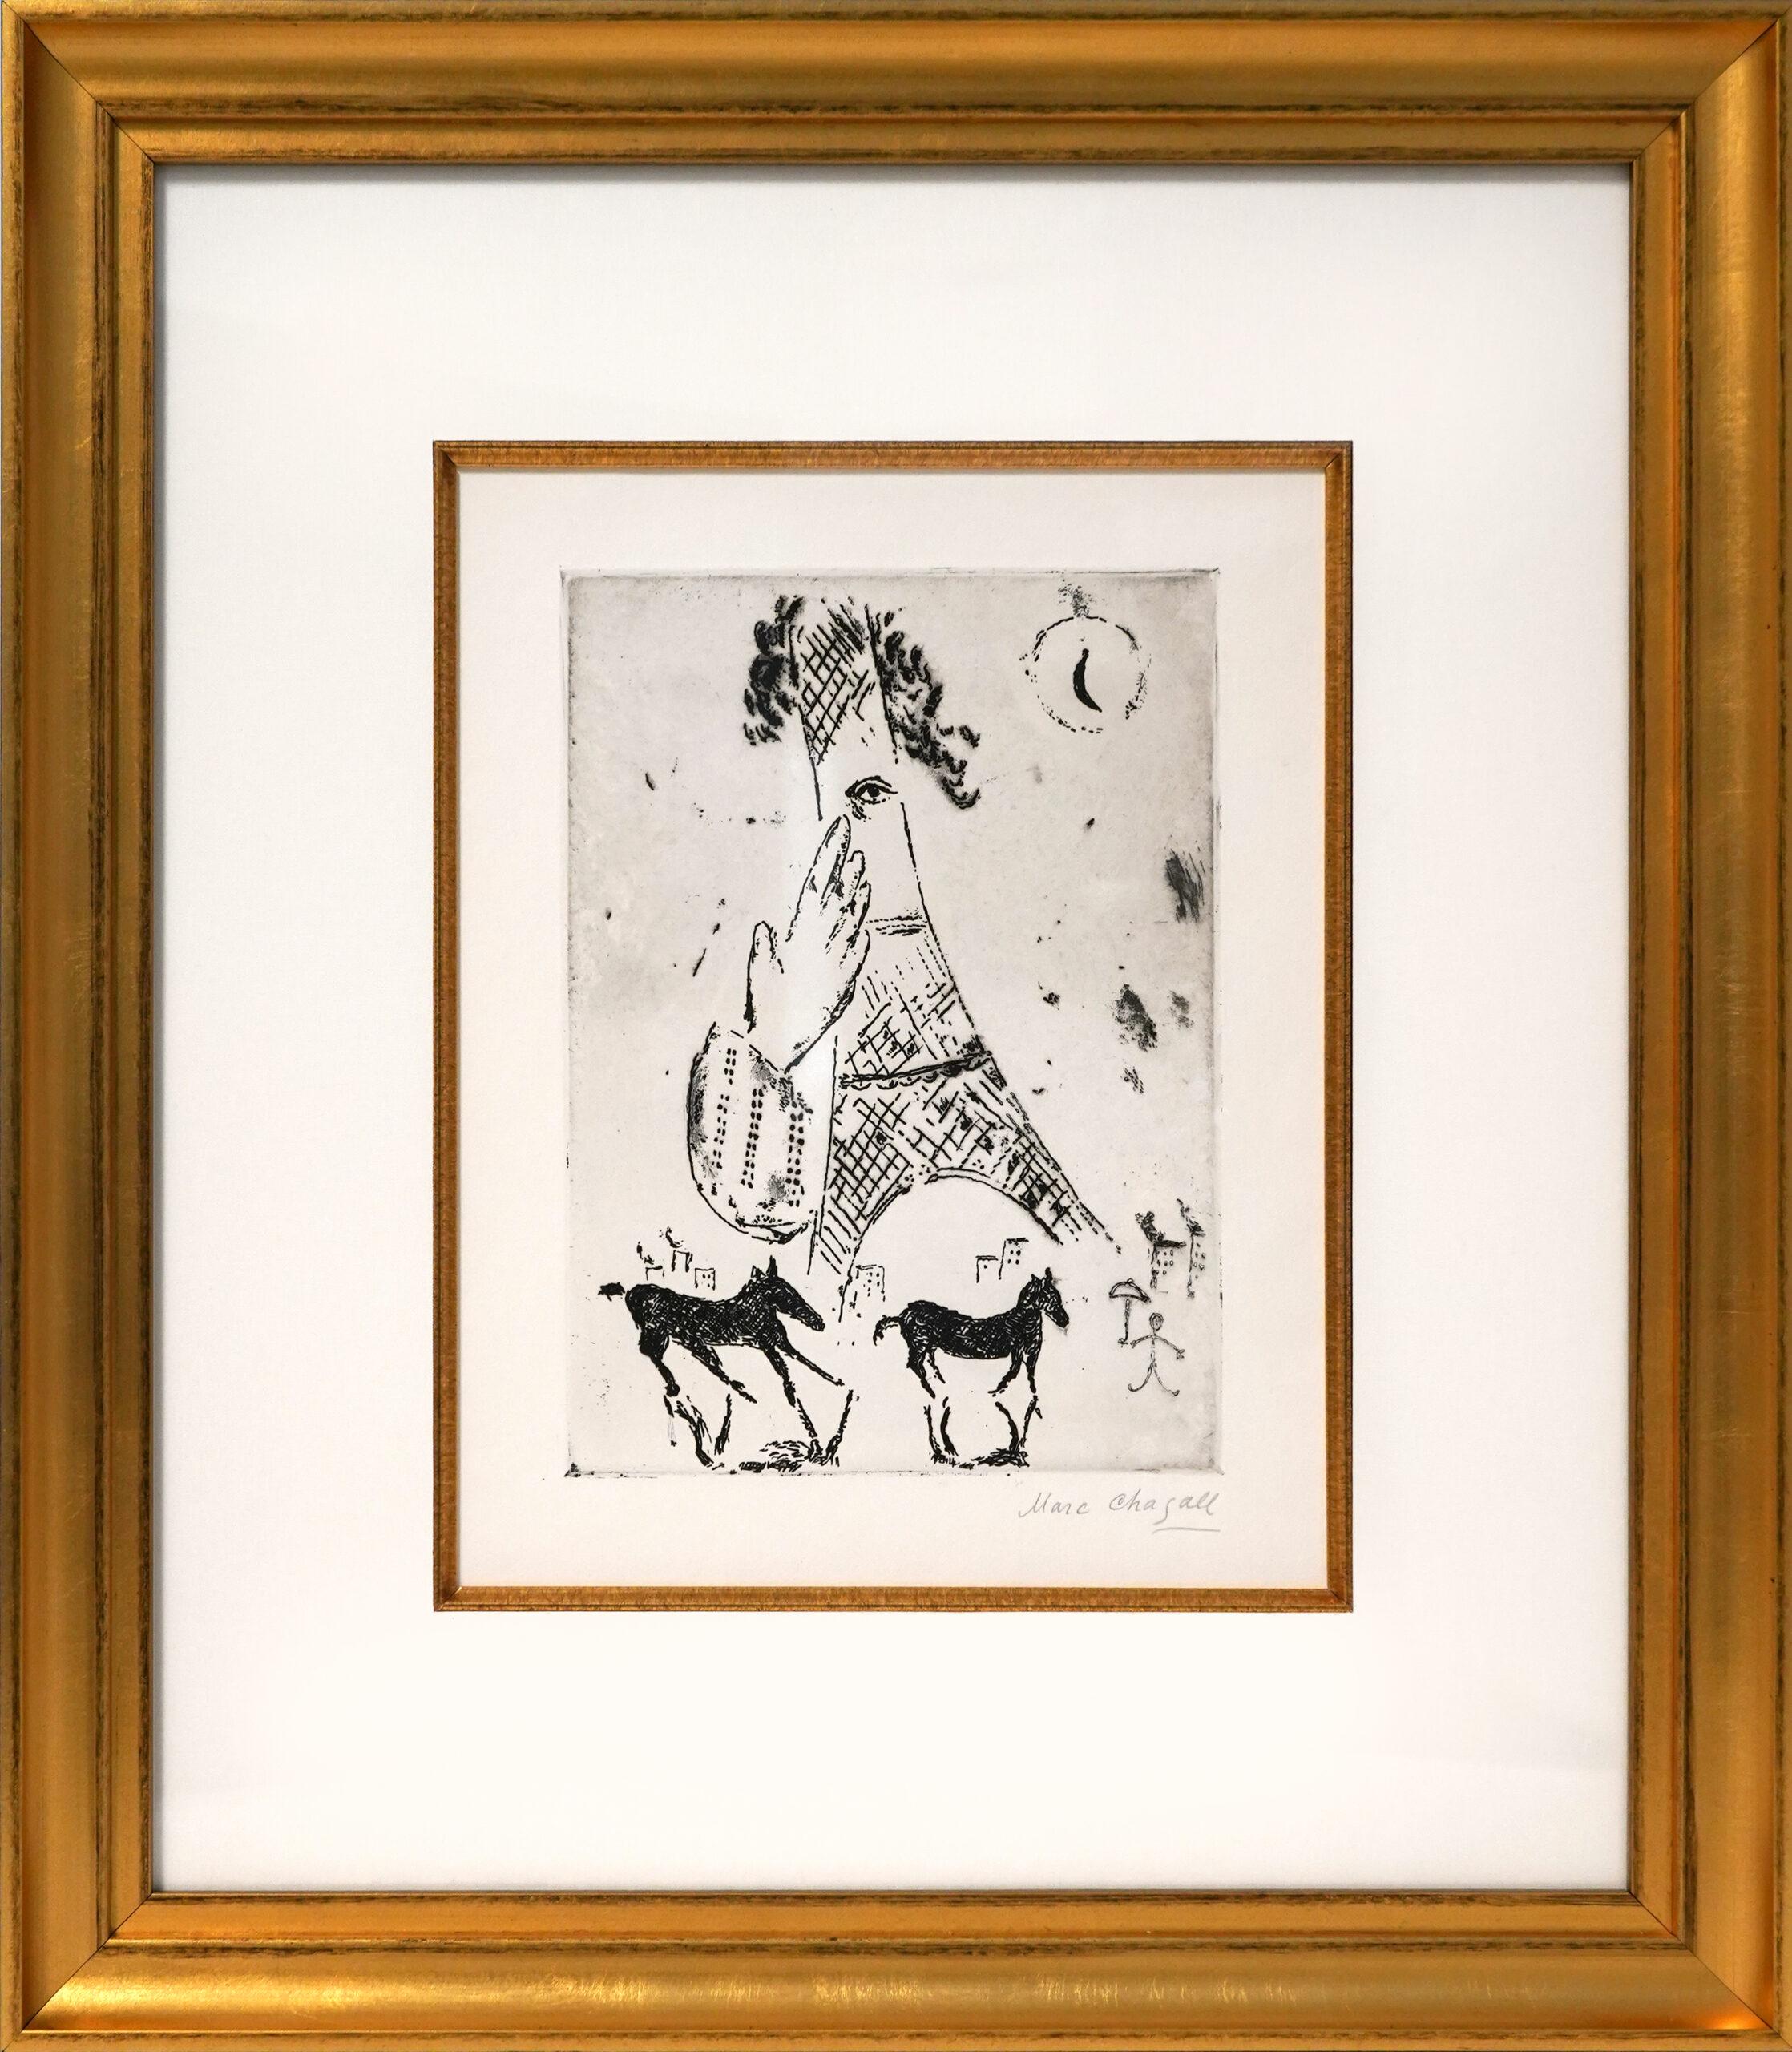 Chagall: Eiffell Tower, from VVV Surrealist Portfolio 2208